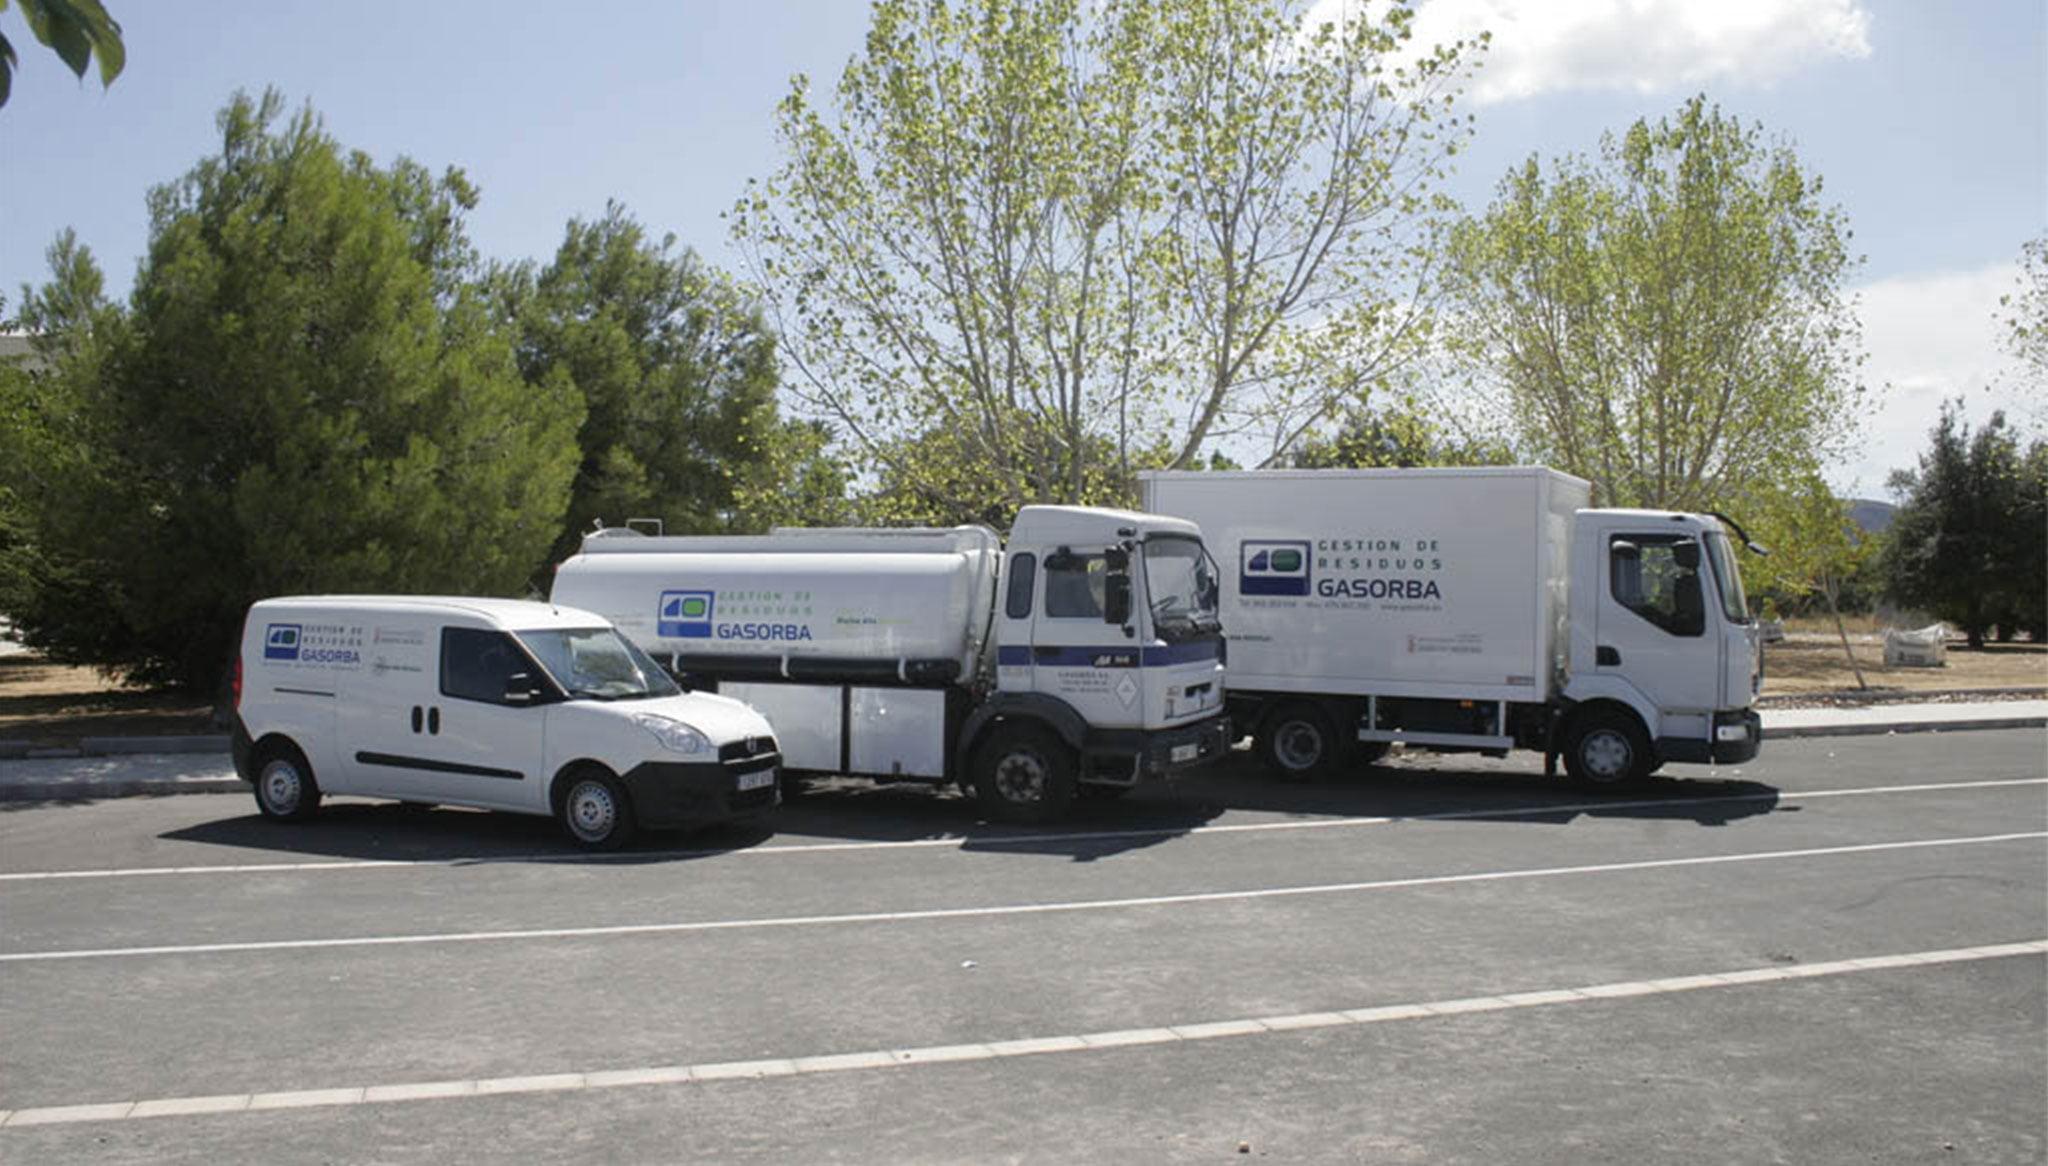 Vehicles de gestió de residus - Gasorba